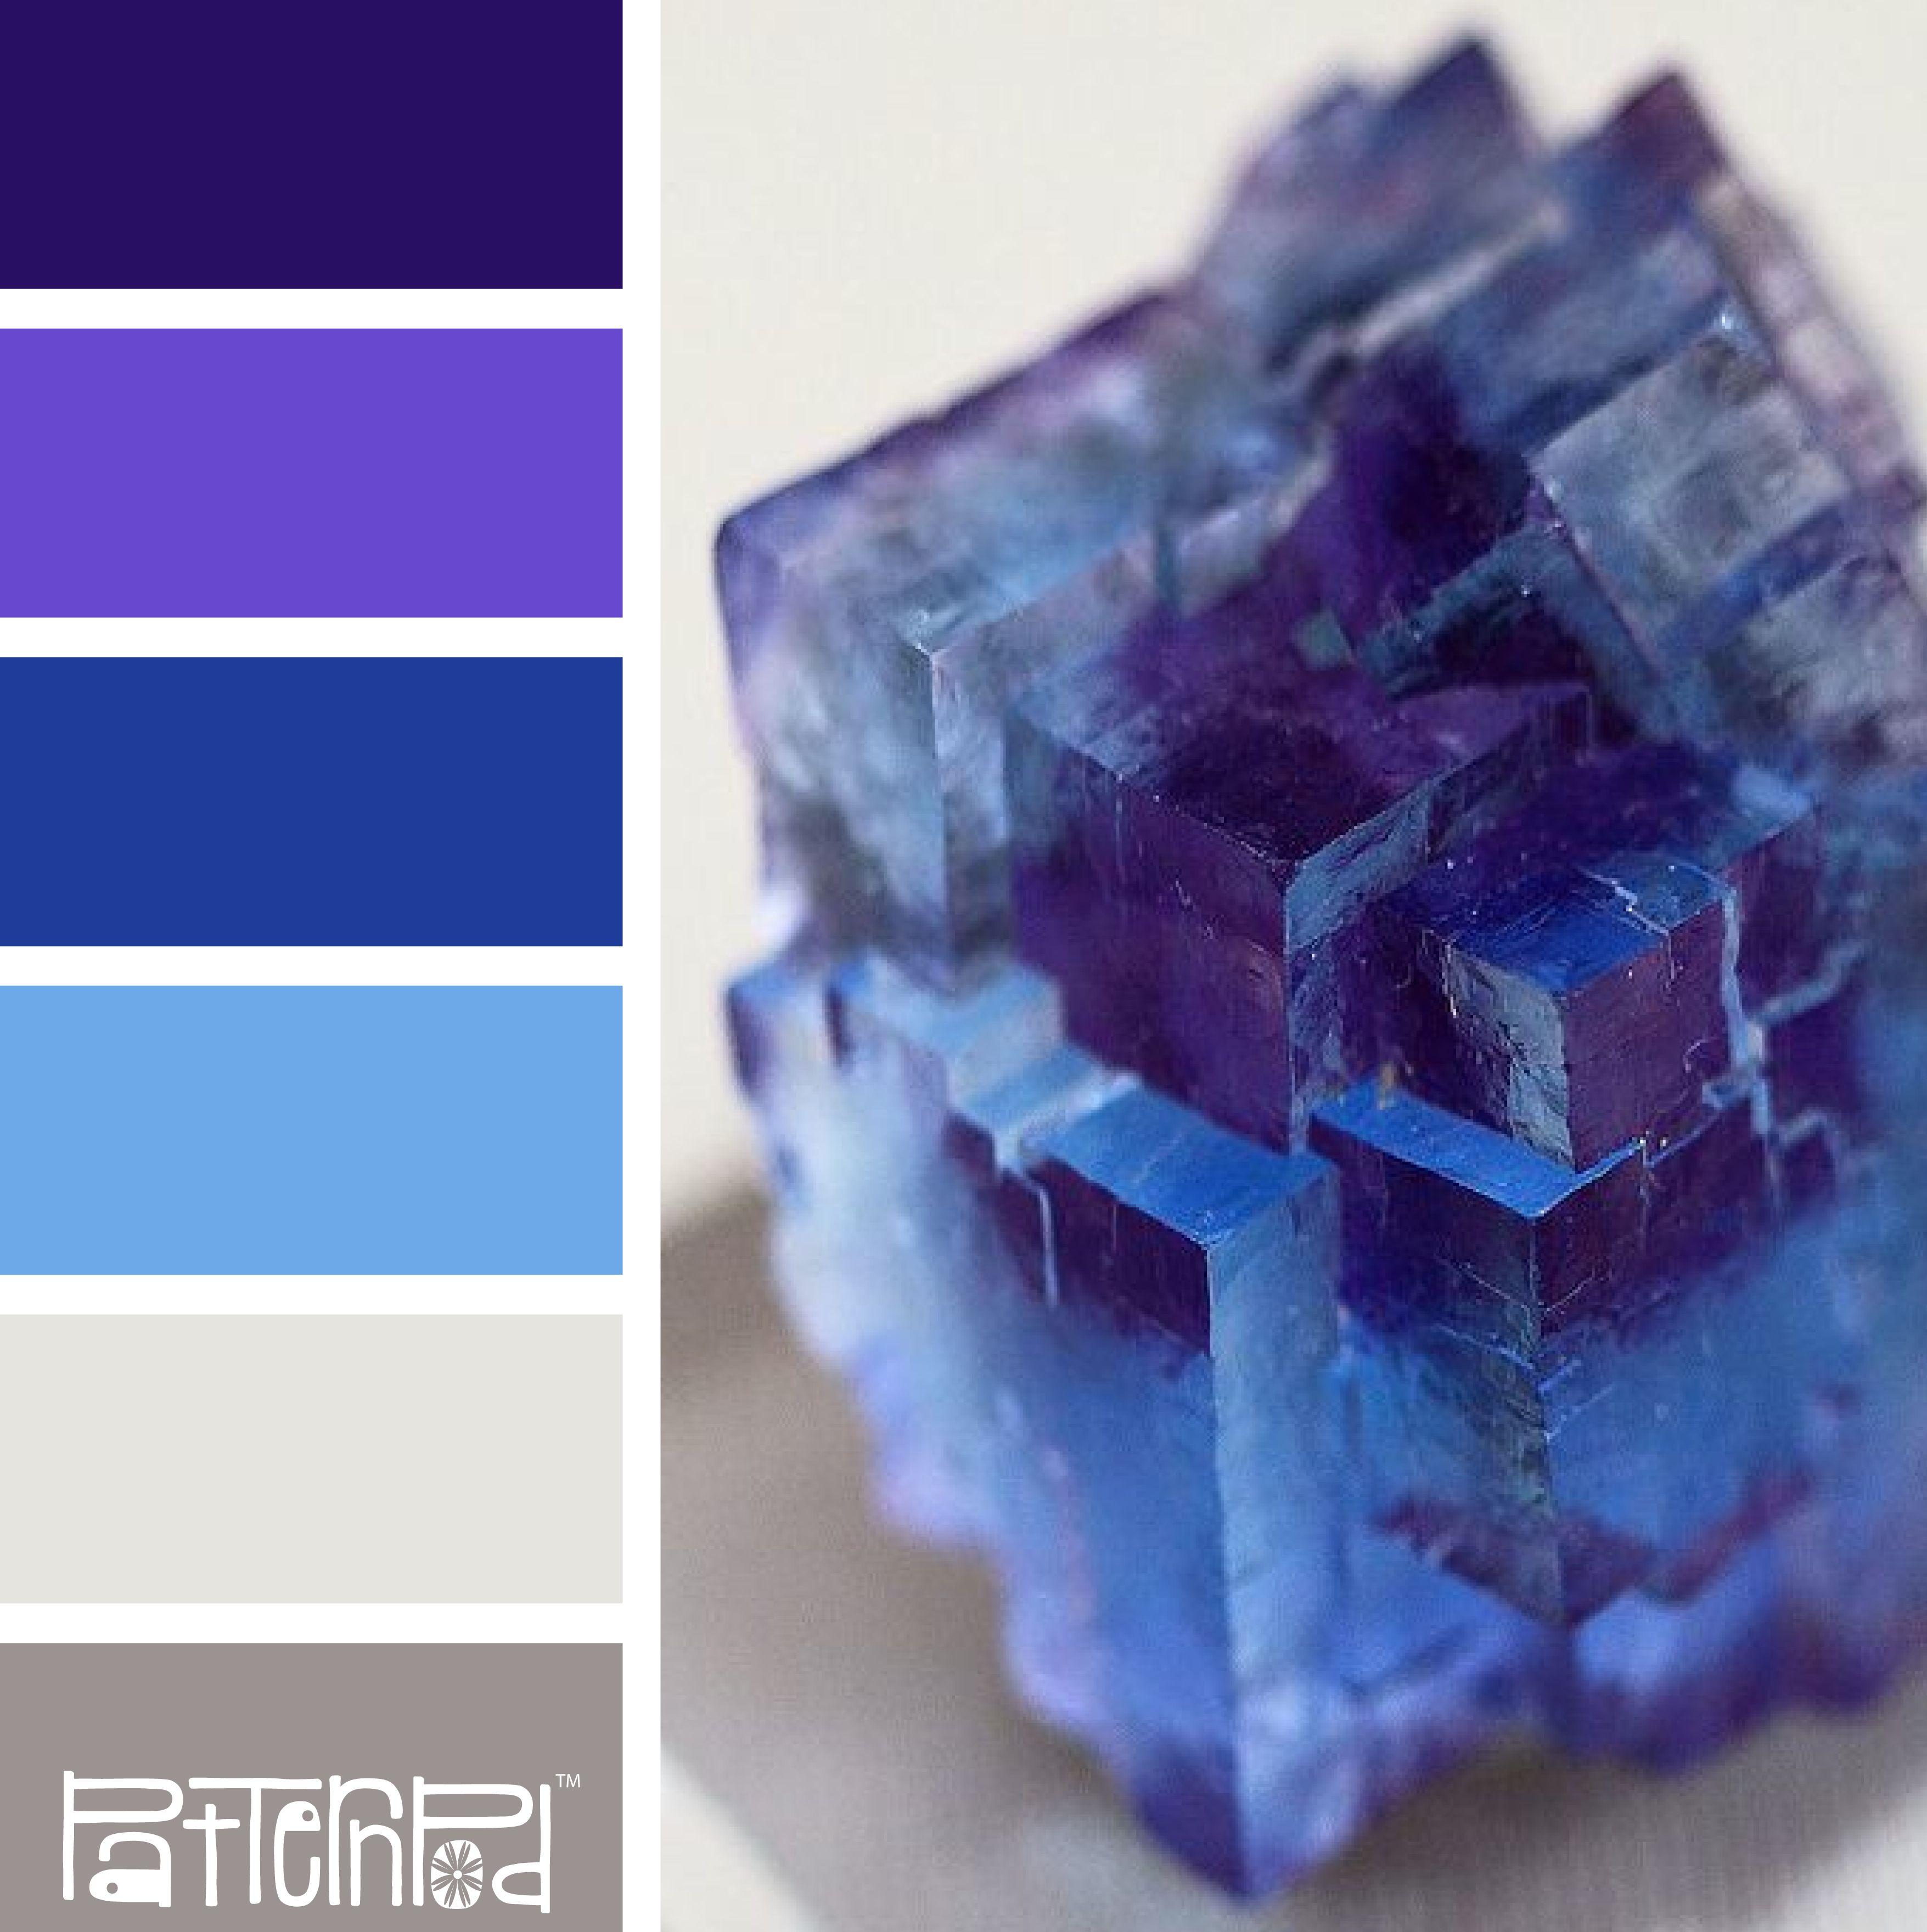 Bluestone #Patternpod #Patternpodcolor #Color #Colorpalettes